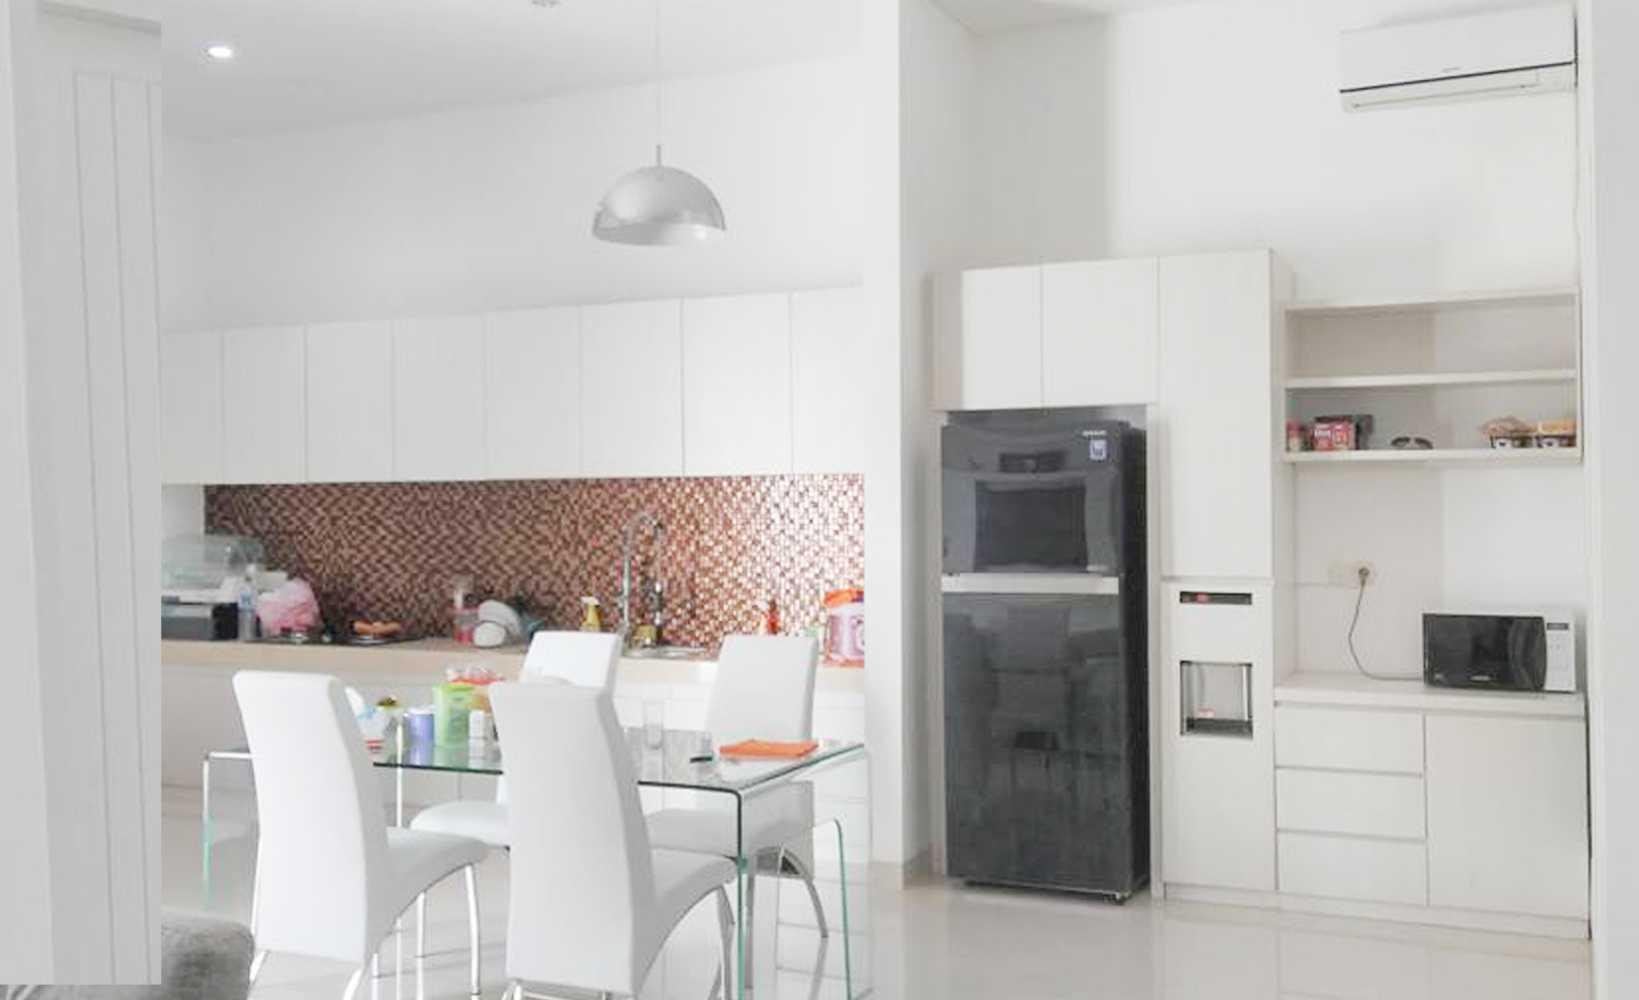 Lalu M. Haris Iqbal - Skye Architect Ard House Mataram, Kota Mataram, Nusa Tenggara Bar., Indonesia Mataram, Kota Mataram, Nusa Tenggara Bar., Indonesia Kitchen Room   42131